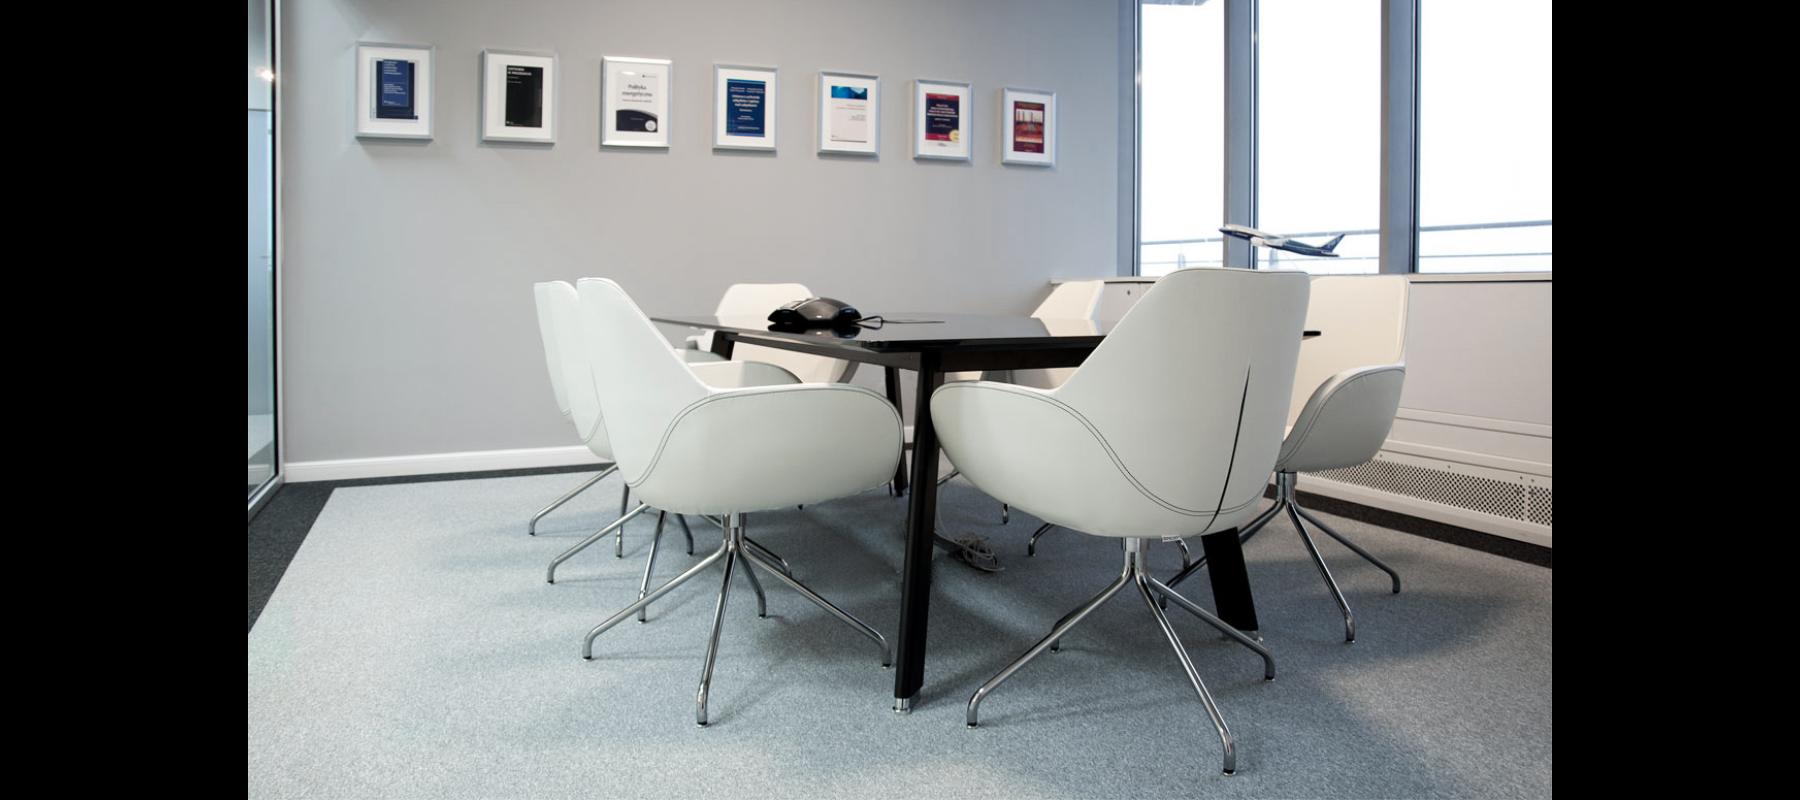 krzesła konferencyjne fan realizacje - 04